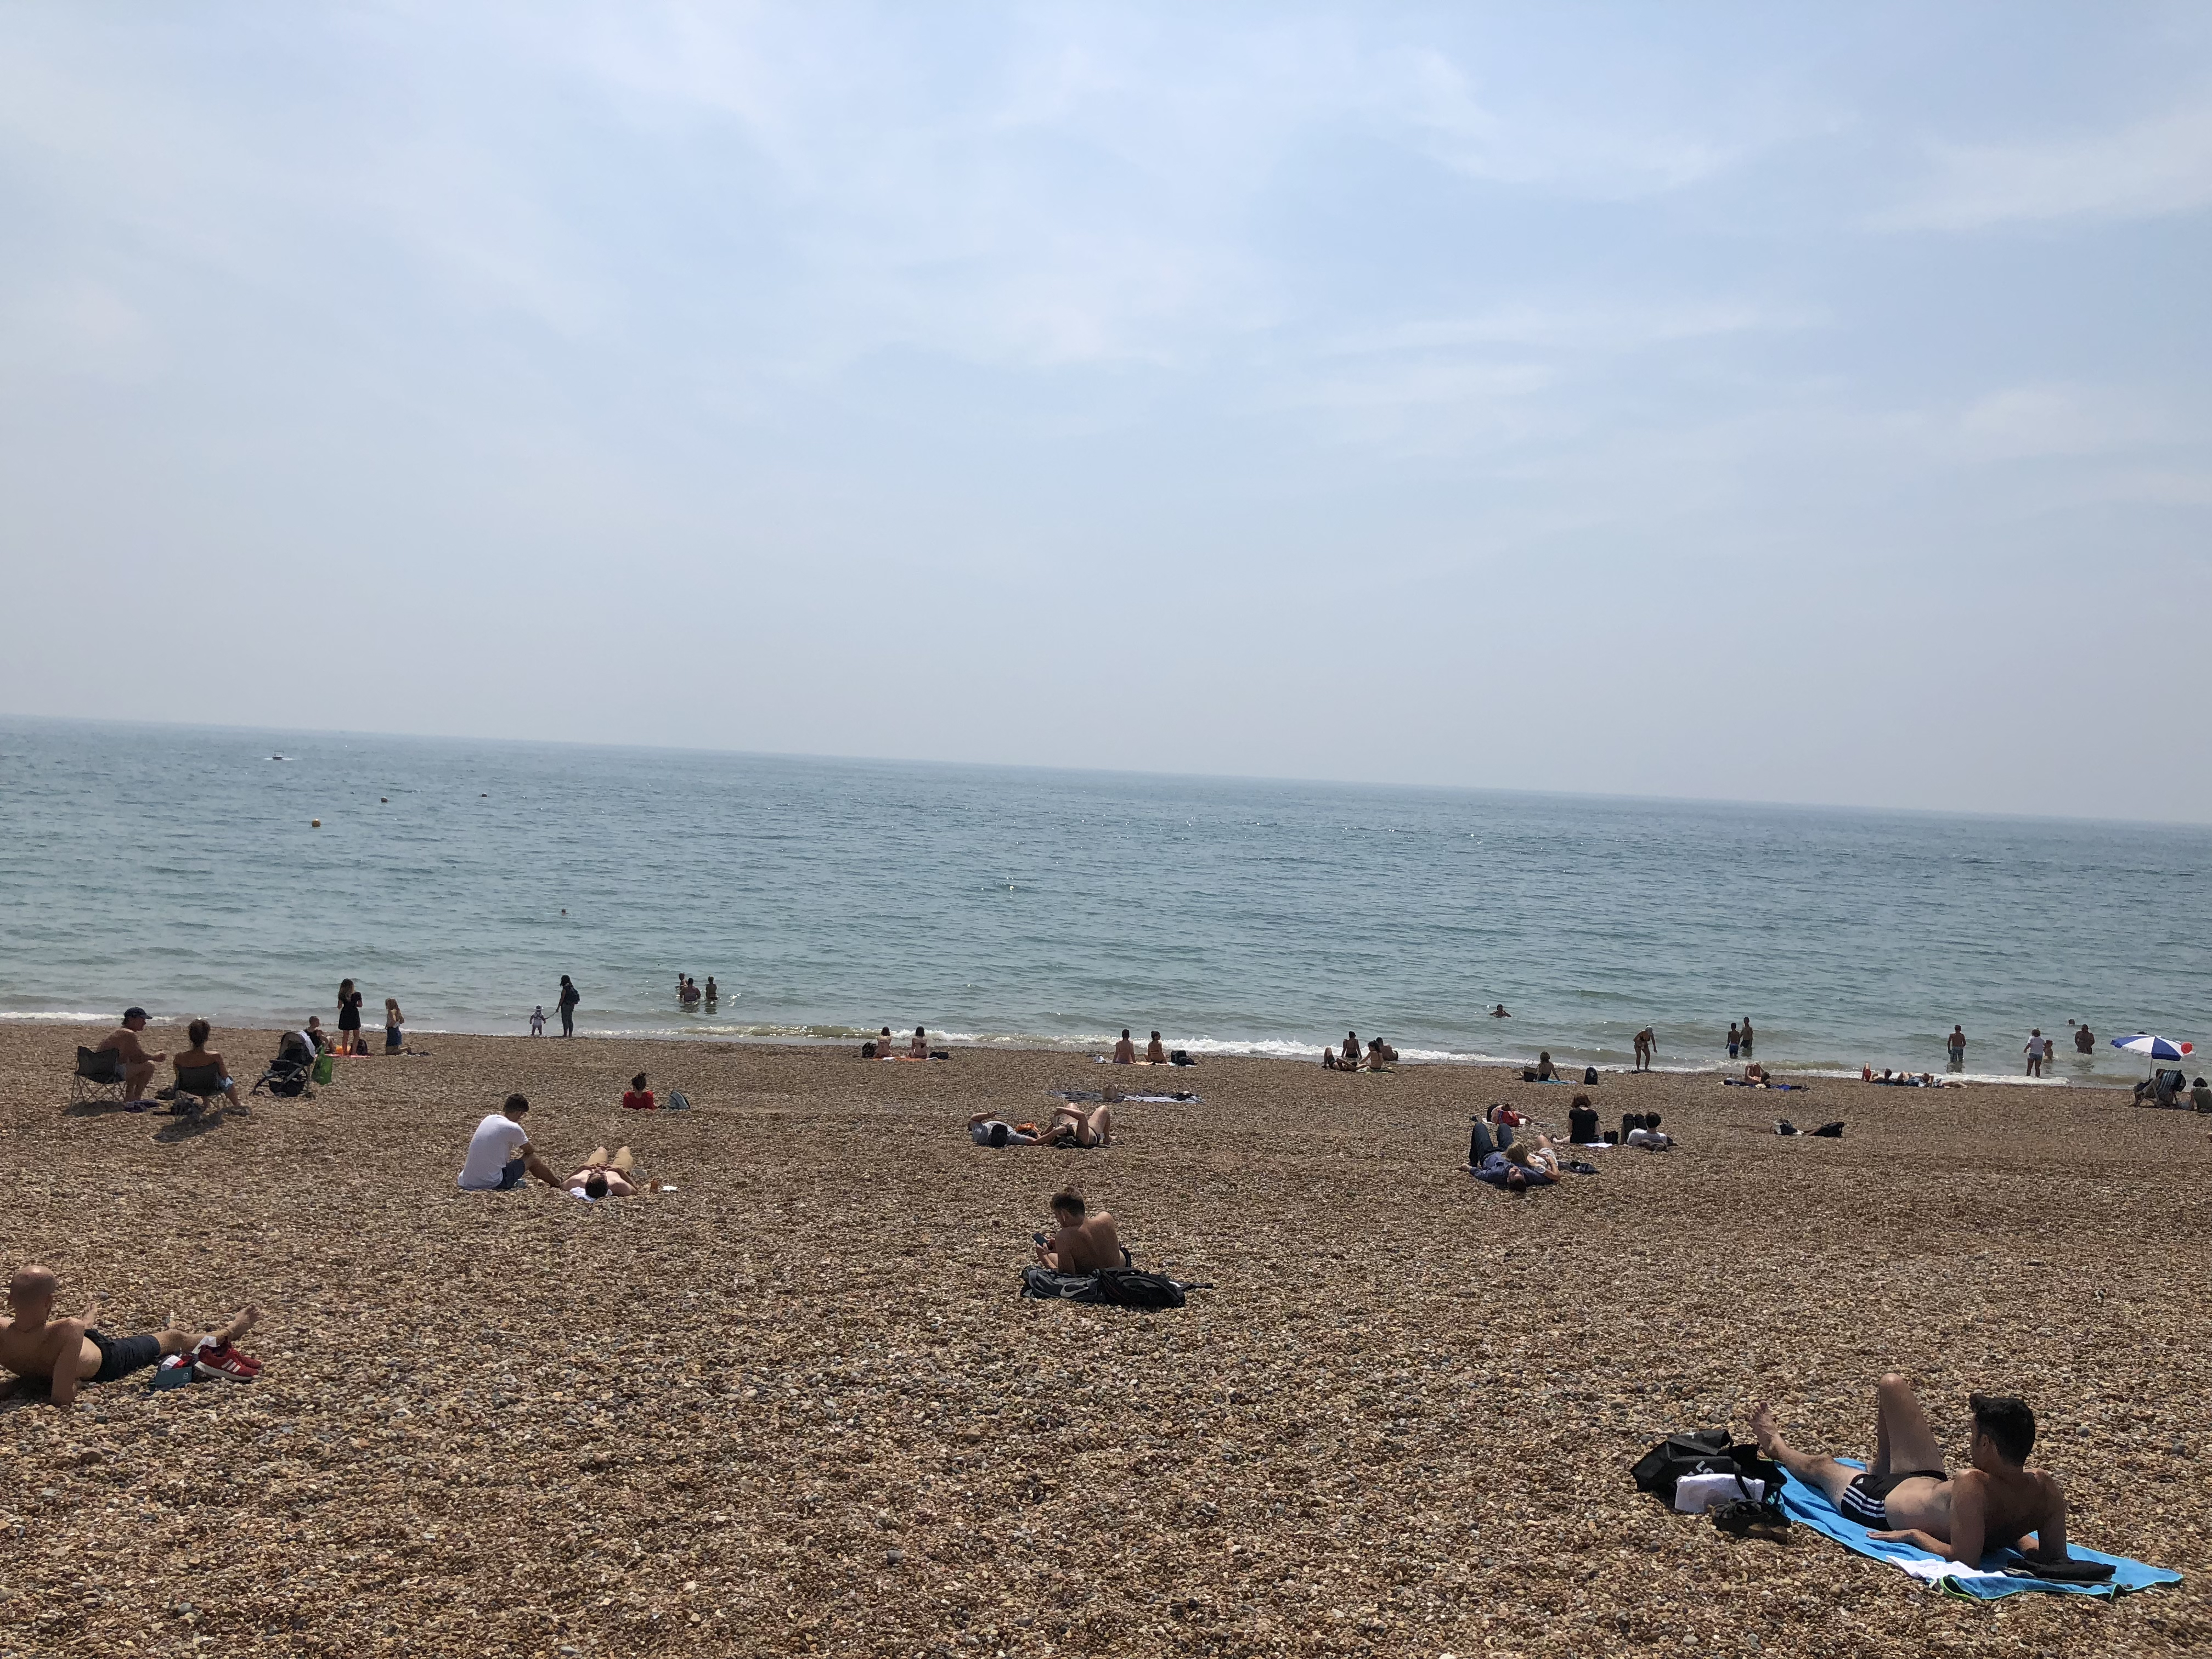 Brighton Ruby 2018 - The beach